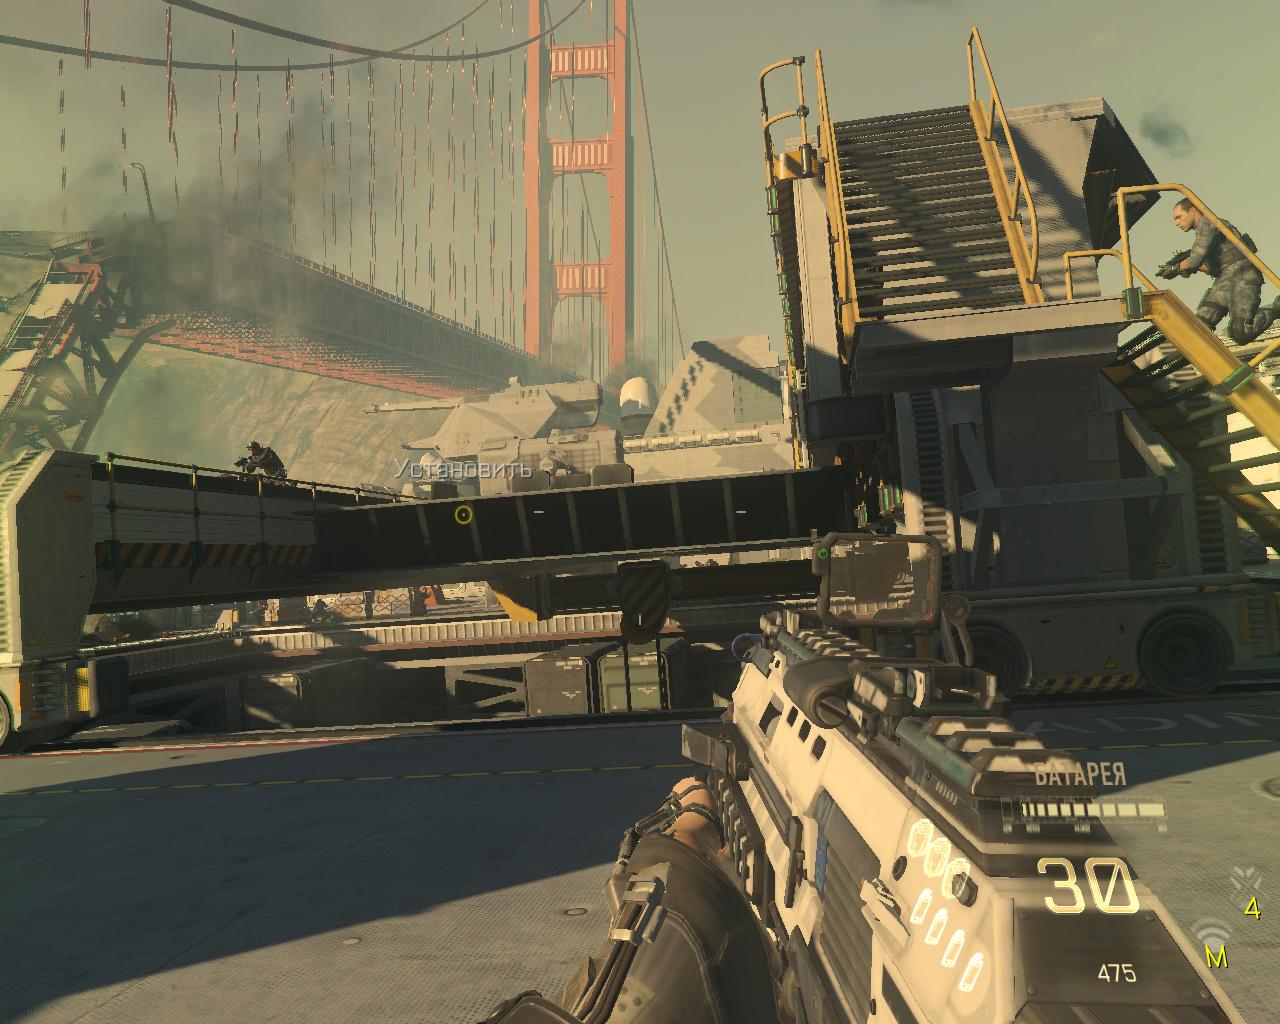 s1_sp64_ship 2016-02-23 23-49-34-019.jpg - Call of Duty: Advanced Warfare